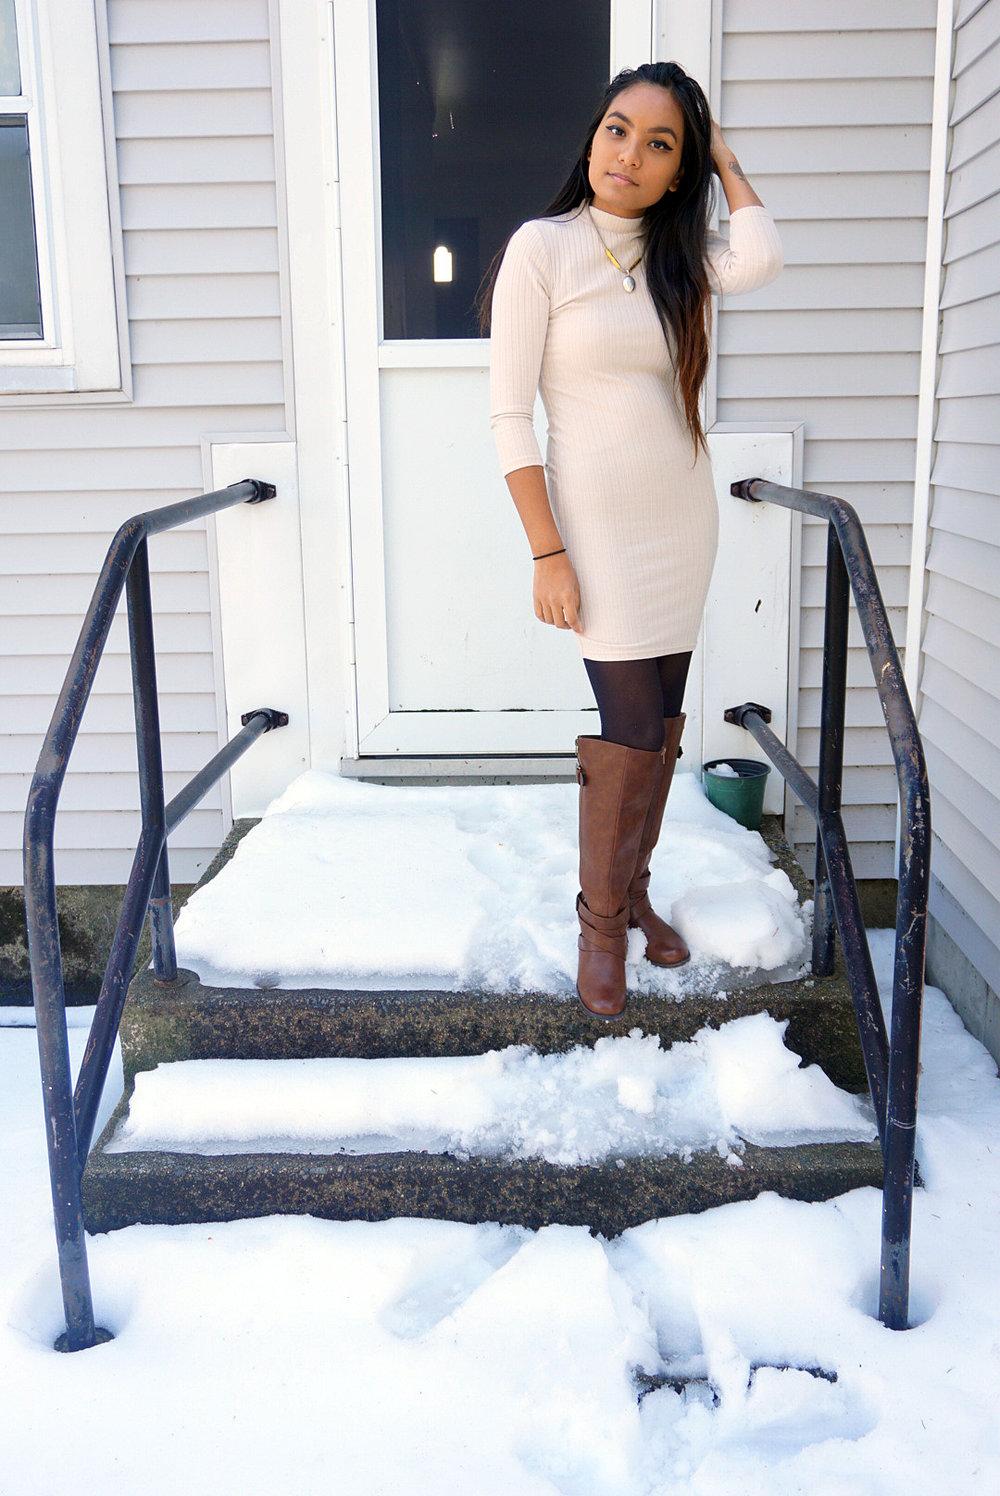 White-Dress-Caramel-Cardigan-Transitioning-To-Spring-Fashionista-Blogger-Style-LINDATENCHITRAN-4-1080x1616.jpg